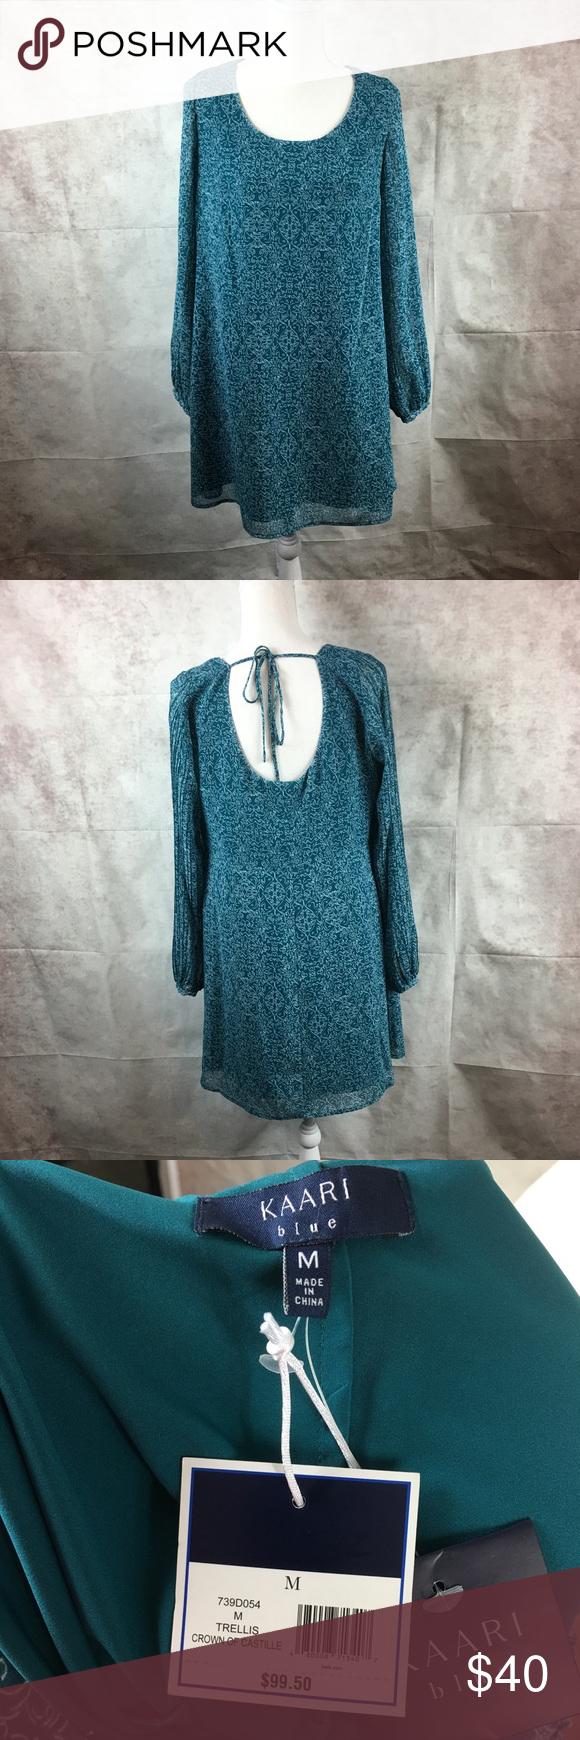 Nwt Kaari Blue Women S Dress Sz M Blue Green Blue Green Dress Clothes Design Green Dress [ 1740 x 580 Pixel ]